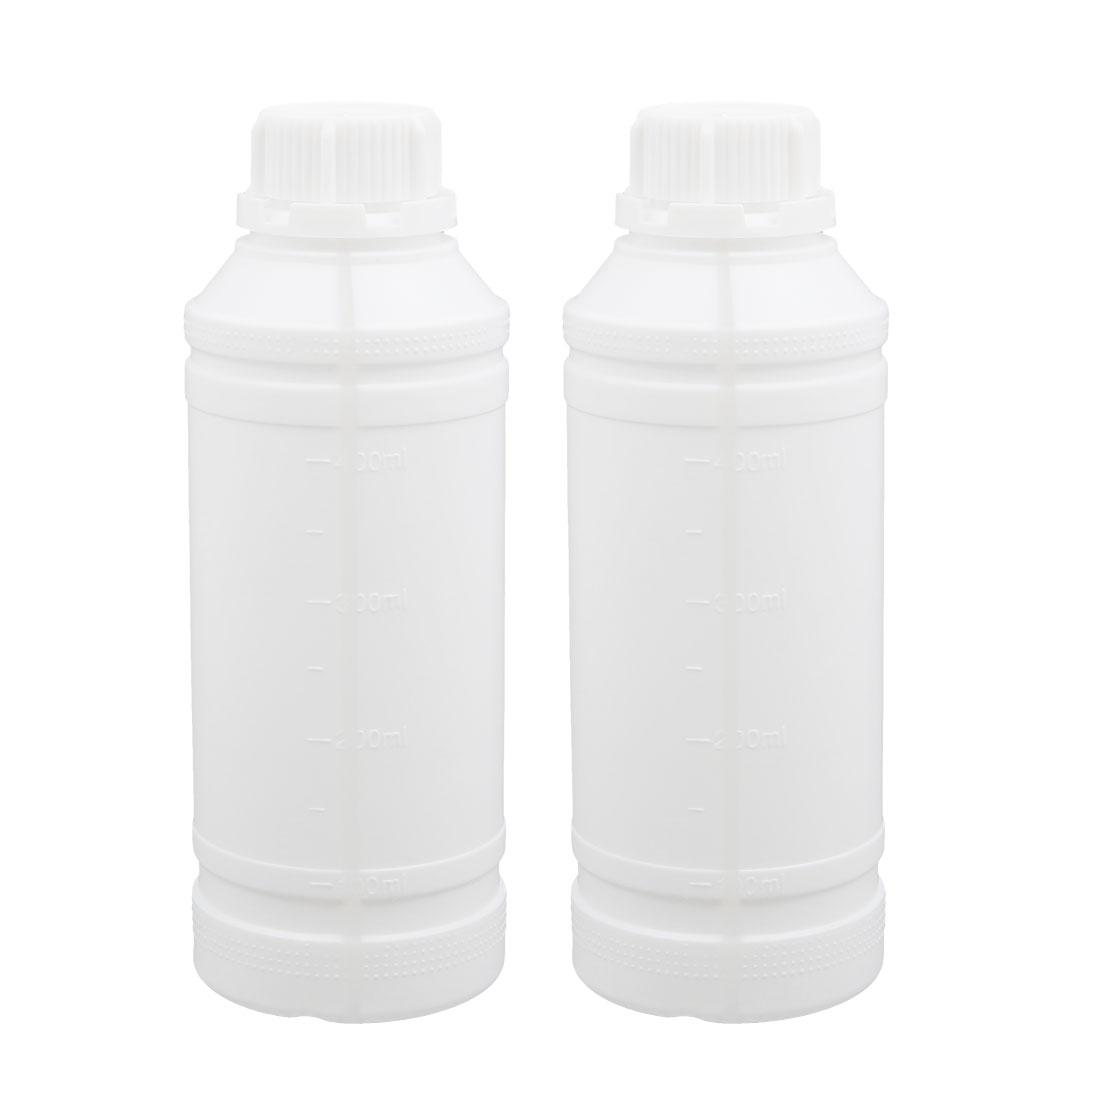 2pcs 17oz HDPE Plastic White Refillable Narrow Mouth Storage Bottle Jar